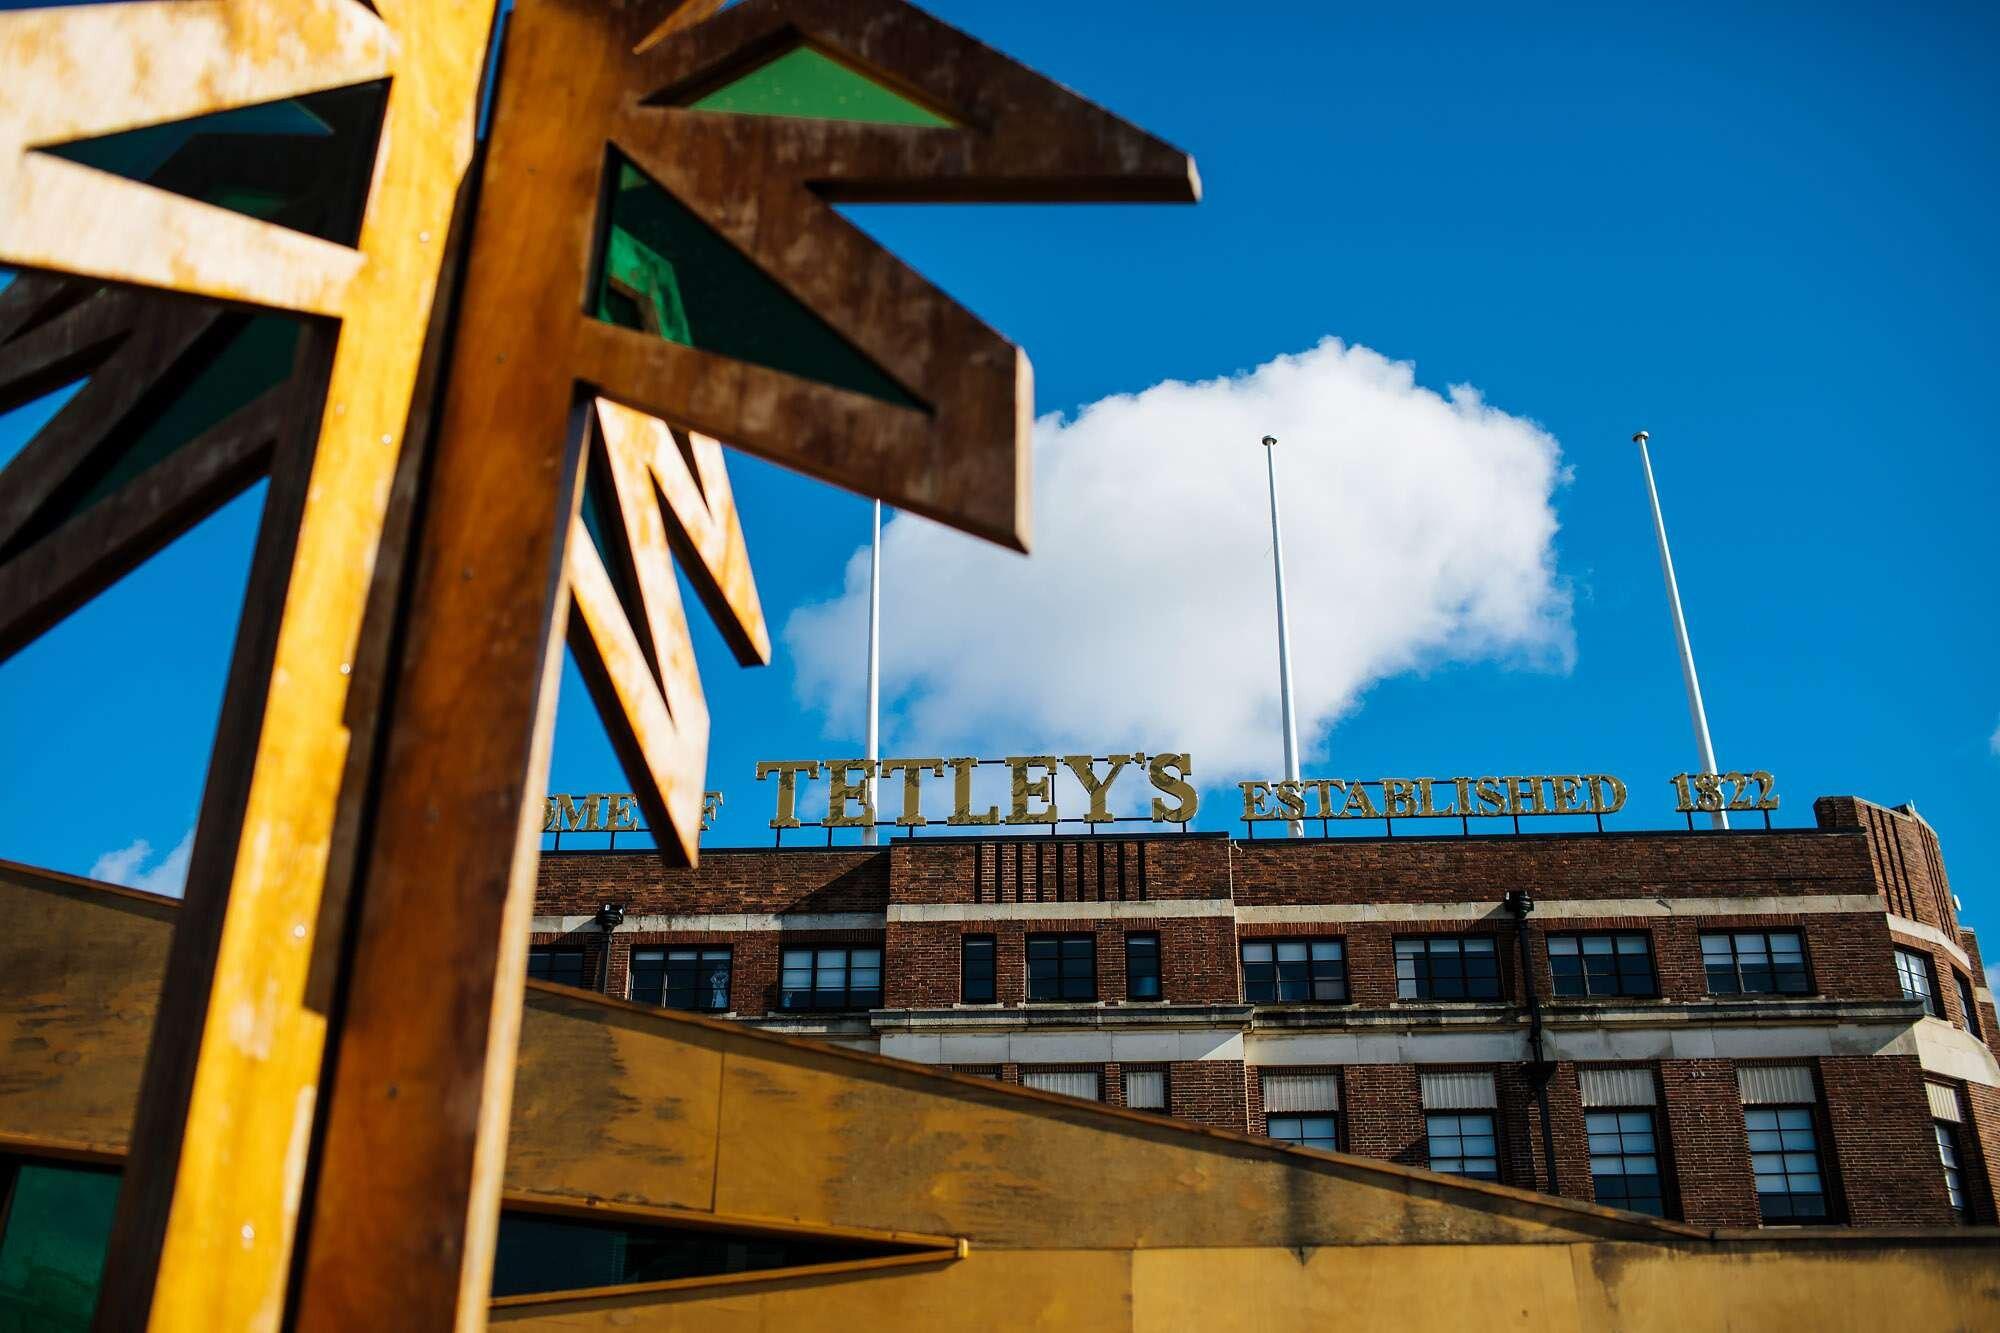 Blue sky over The Tetley Leeds wedding